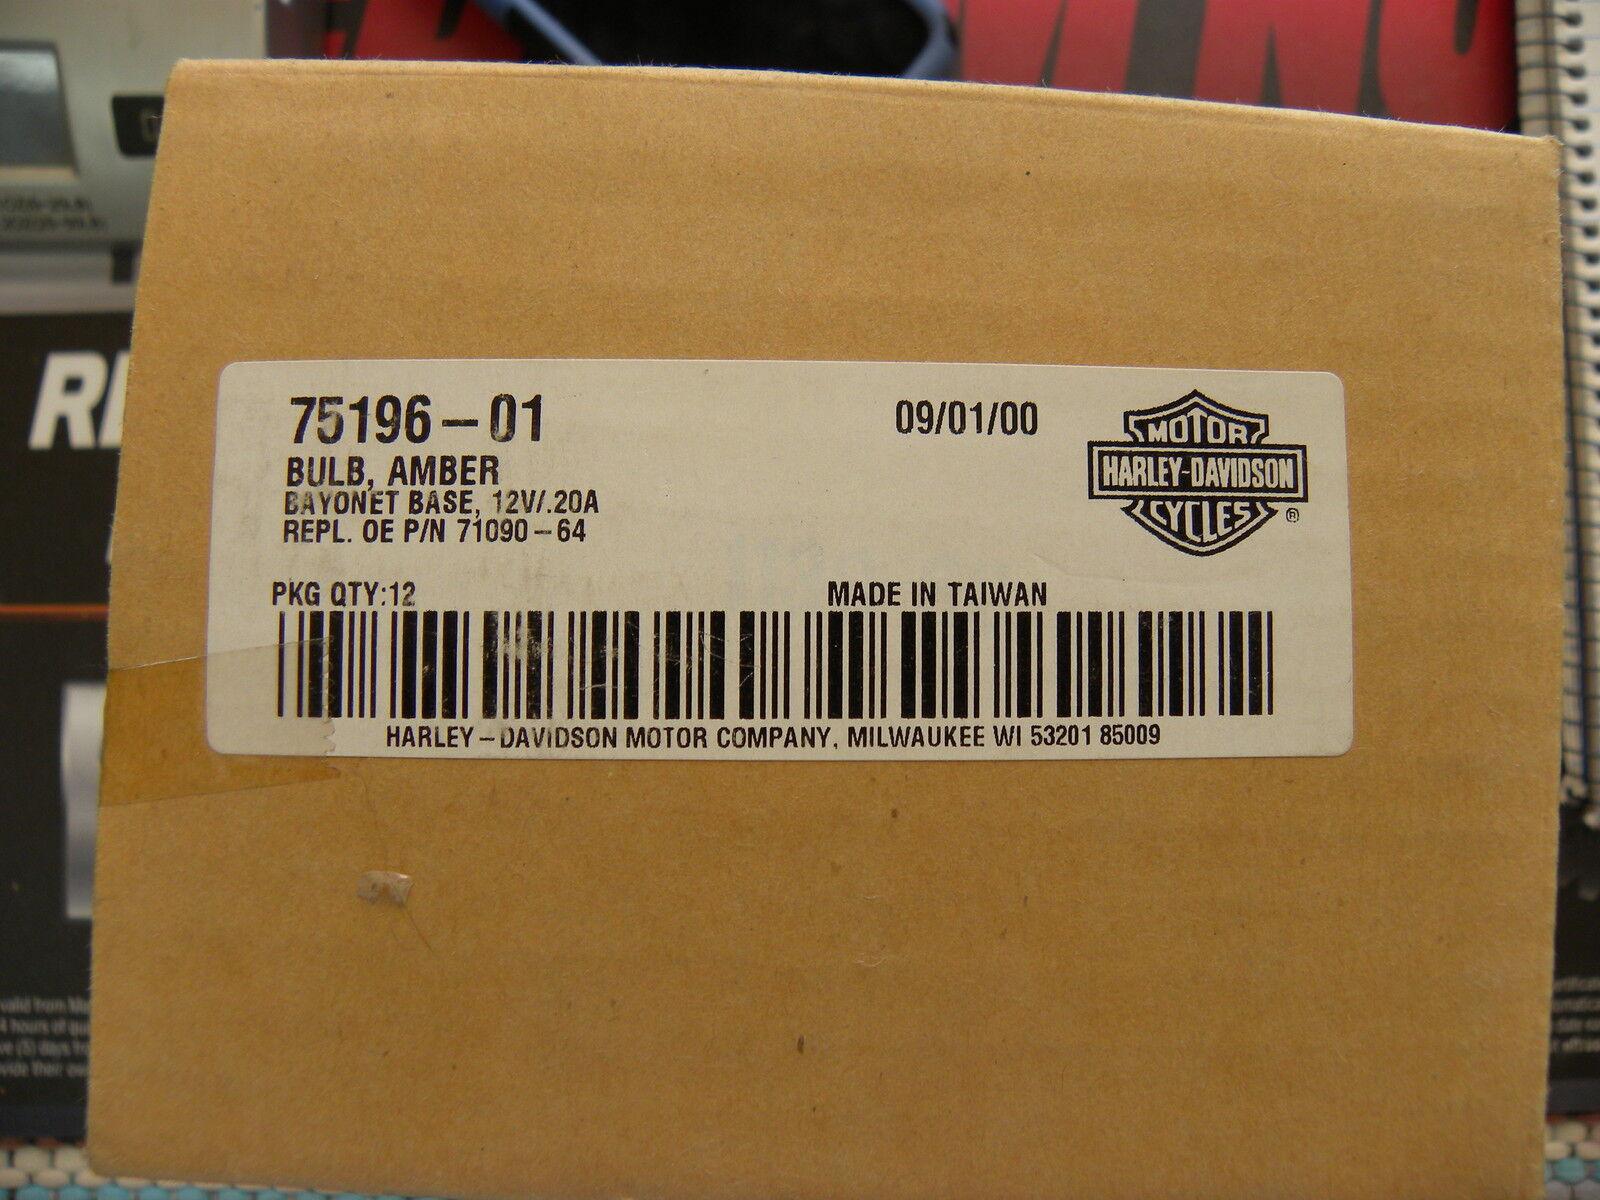 Harley Davidson Amber Light Bulbs 75199-01 NOS OEM 2 PACK 12V .12A Orange Bulb